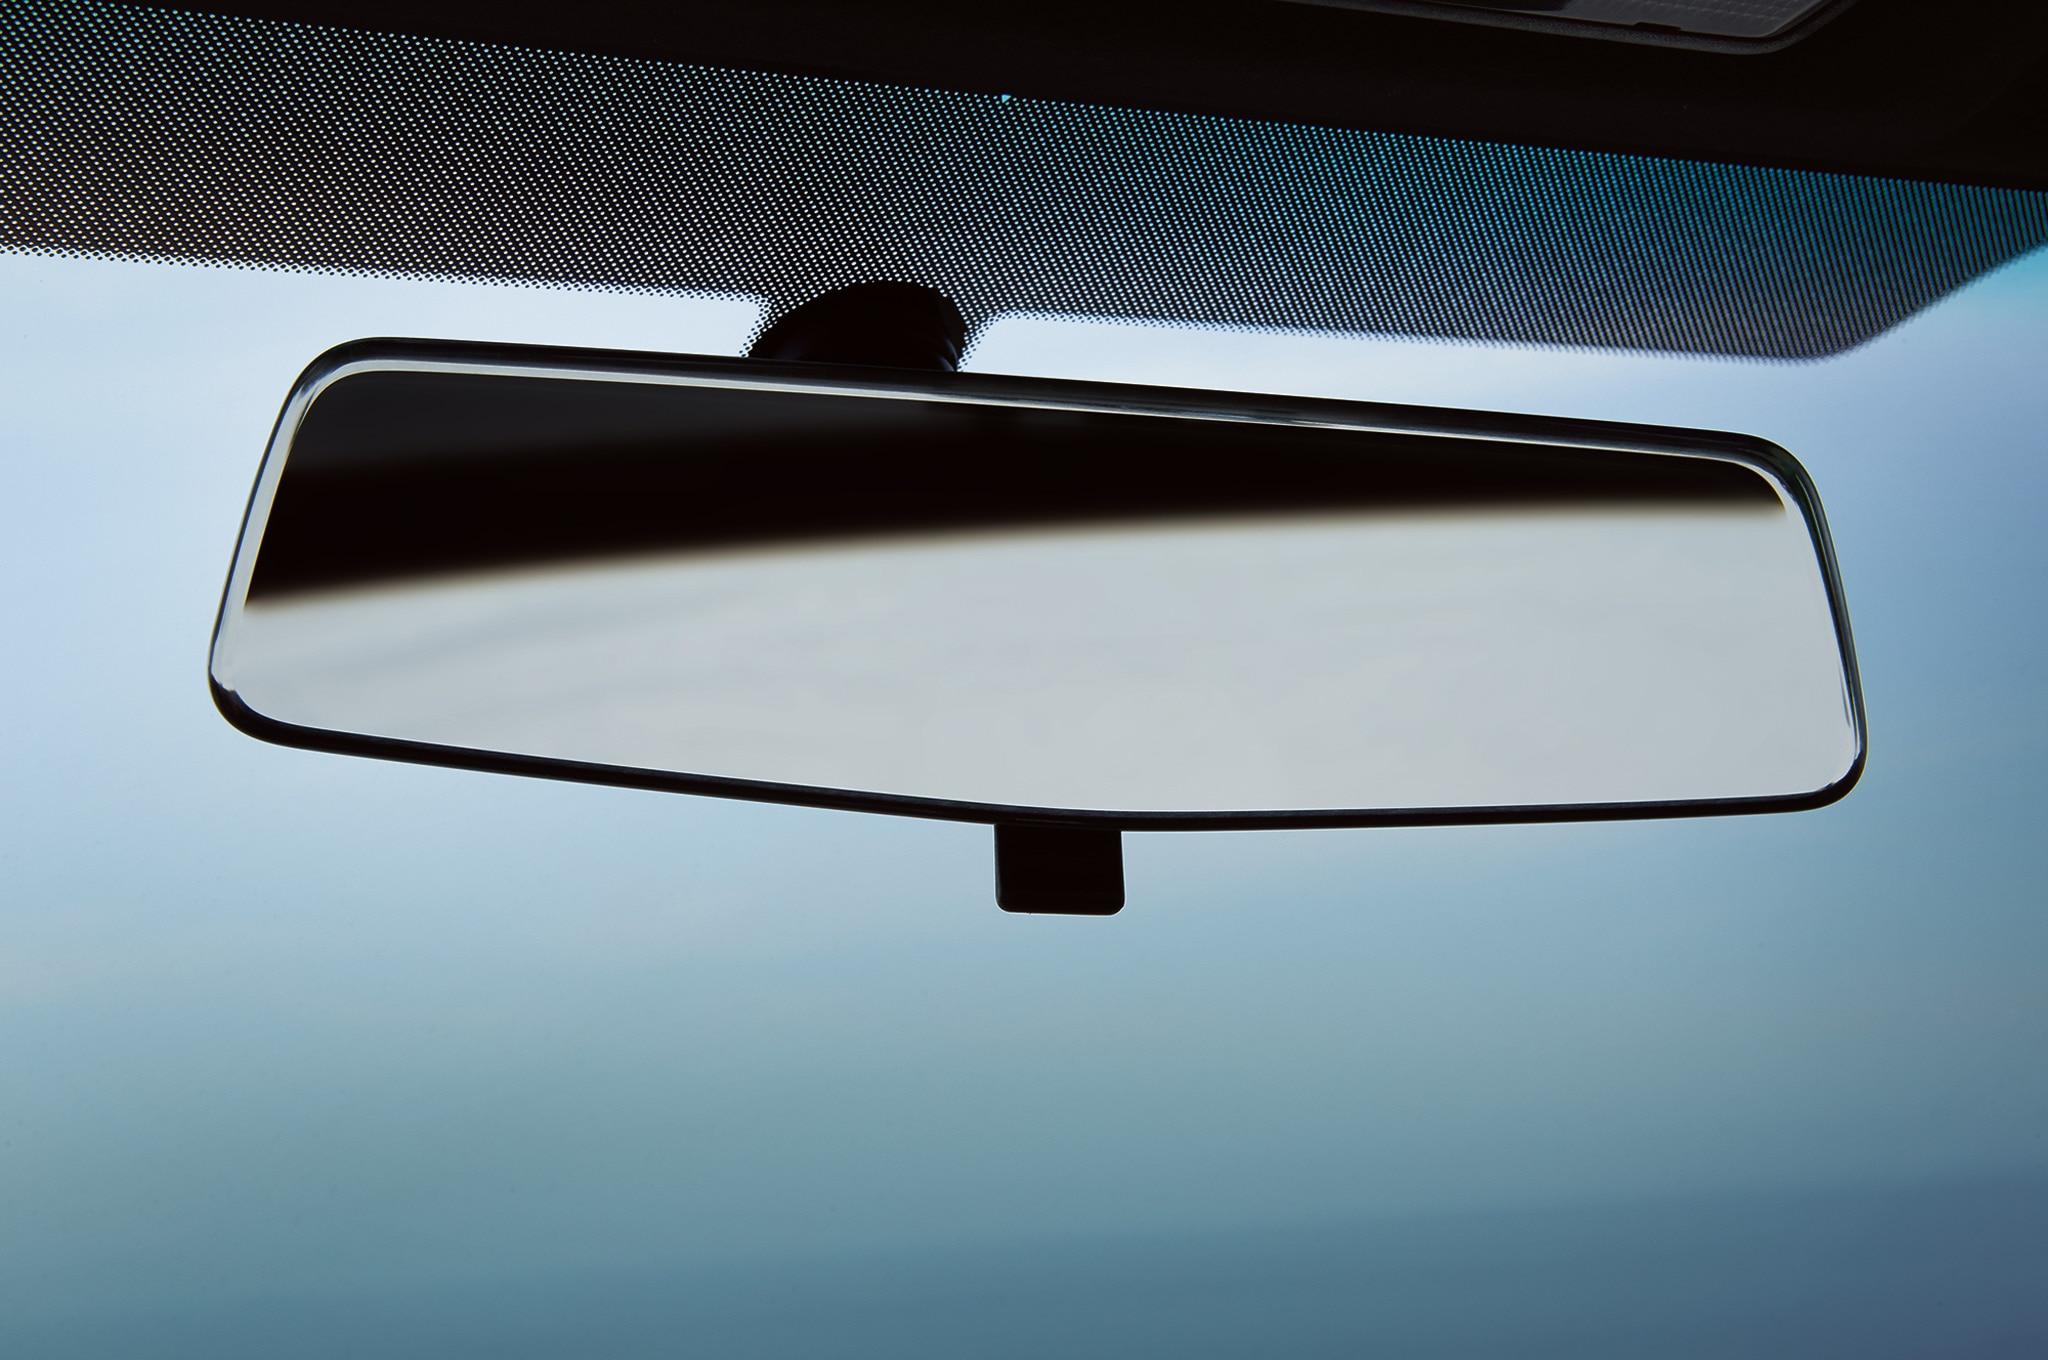 2015 subaru brz adds series blue model automobile magazine. Black Bedroom Furniture Sets. Home Design Ideas